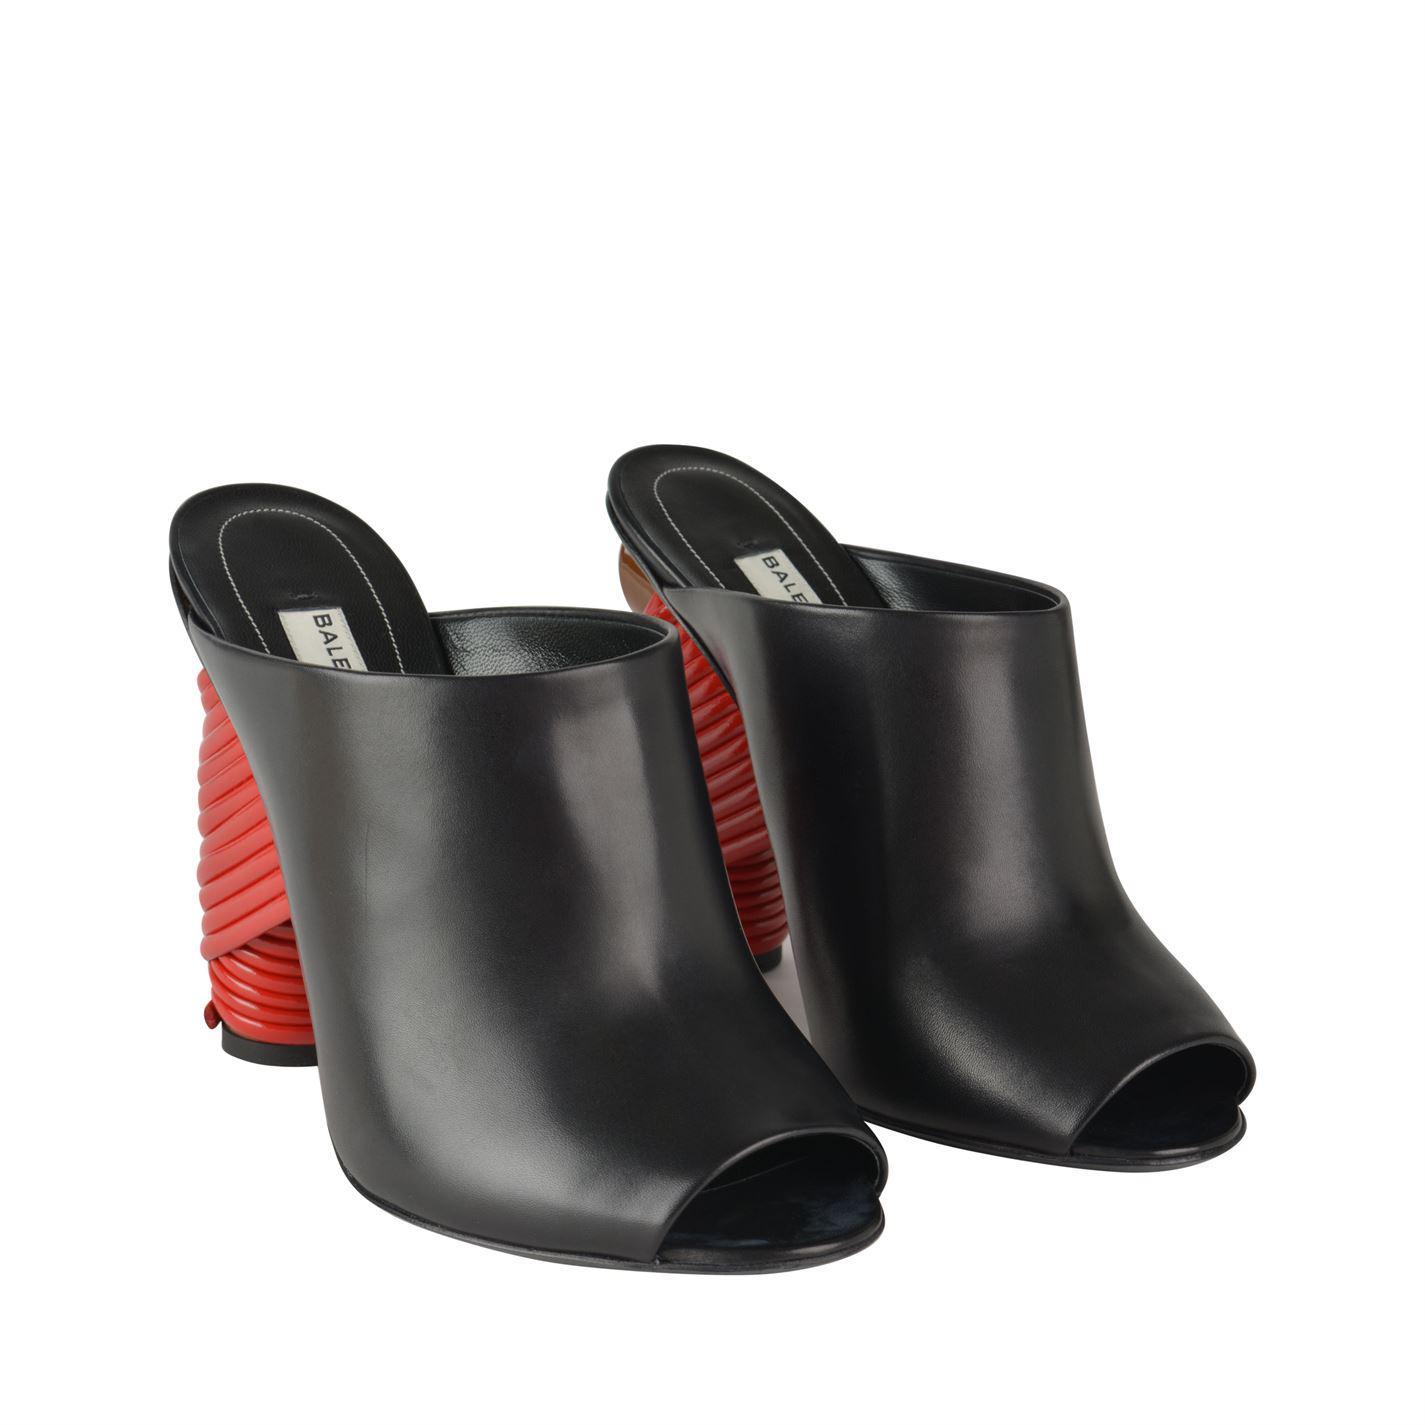 2900693ee36f Balenciaga Bistrot 110mm Mule Black red in Black - Lyst